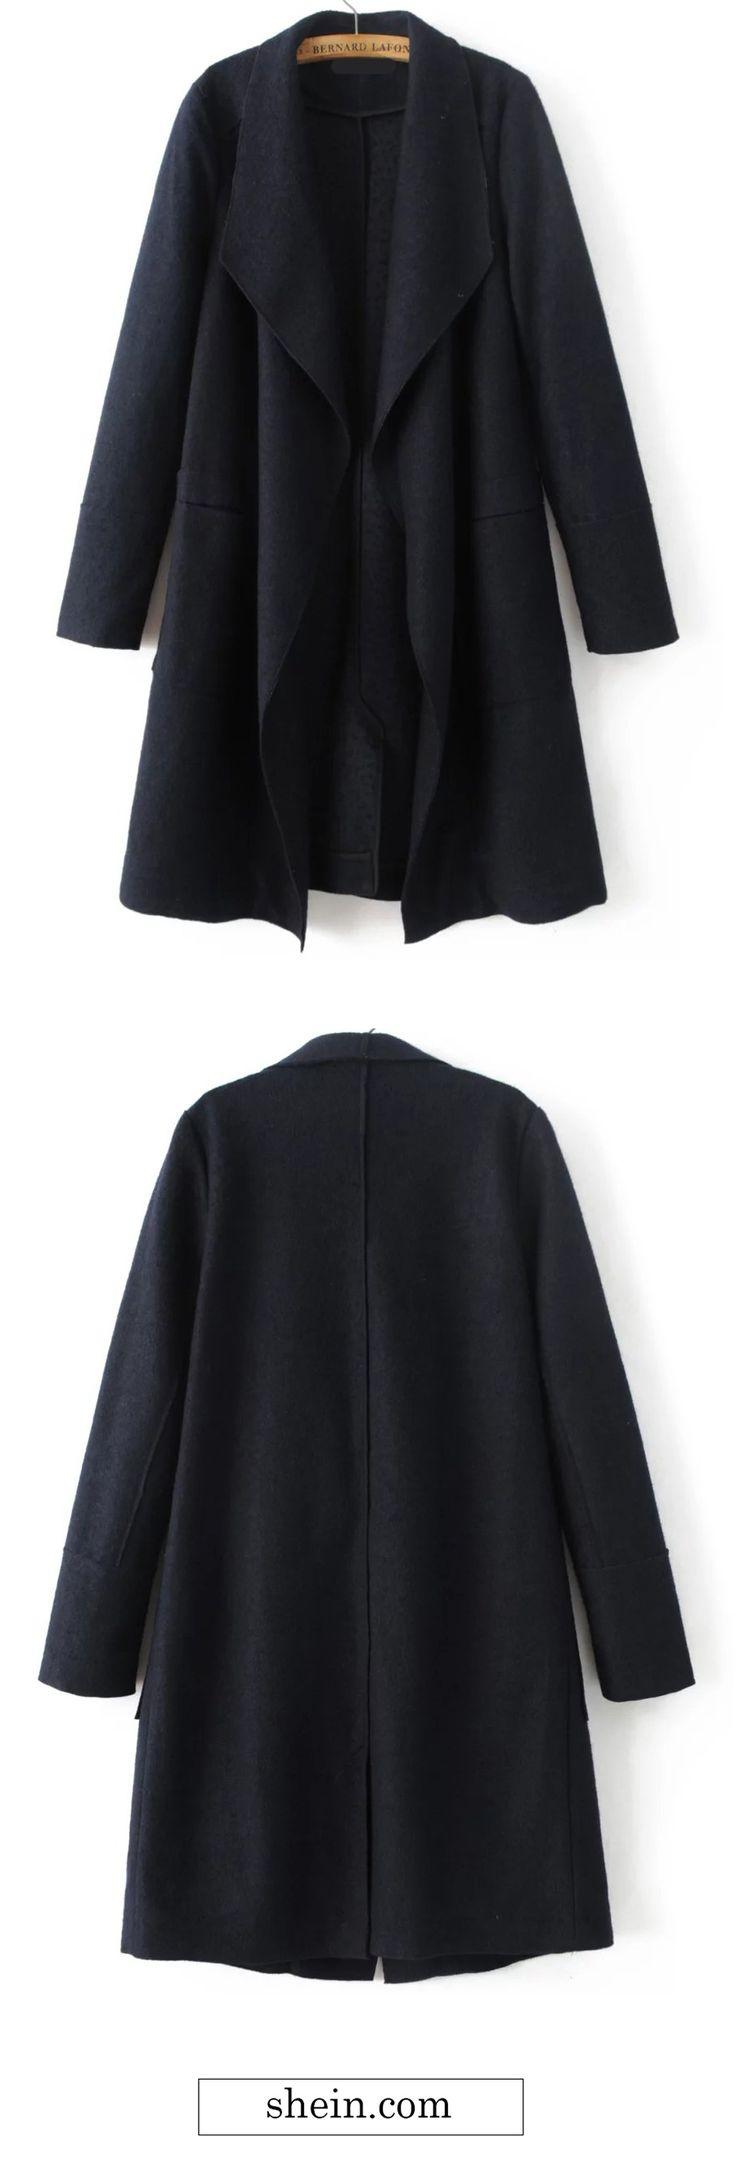 Black Waterfall Collar Wool Blend Coat